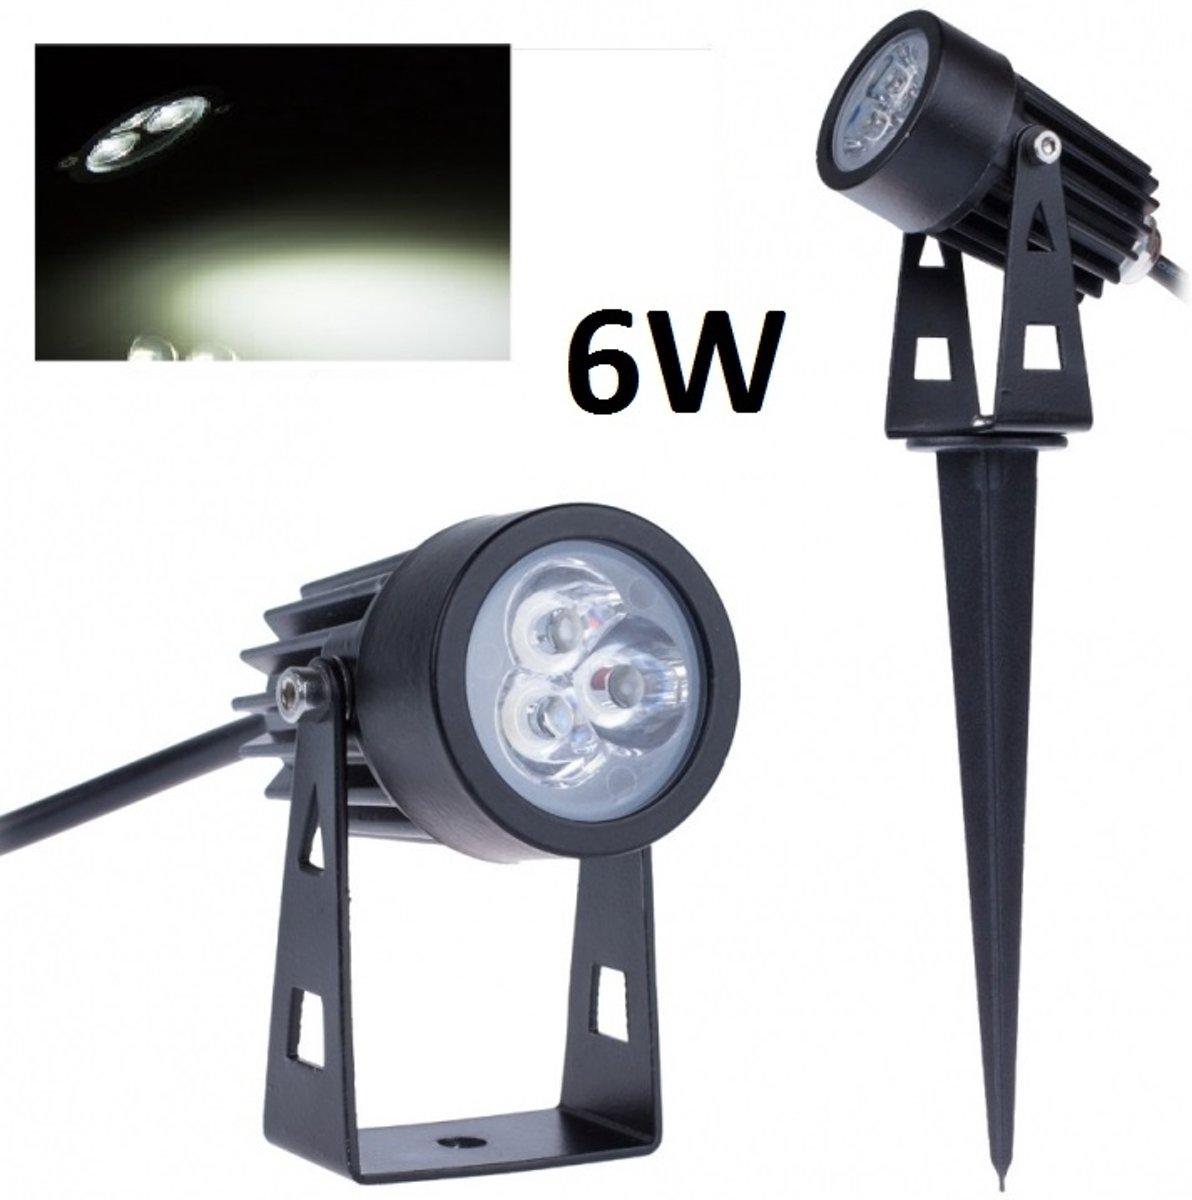 bol.com   LED tuinverlichting - 6W - grond spot 12V - Koud Wit + ...